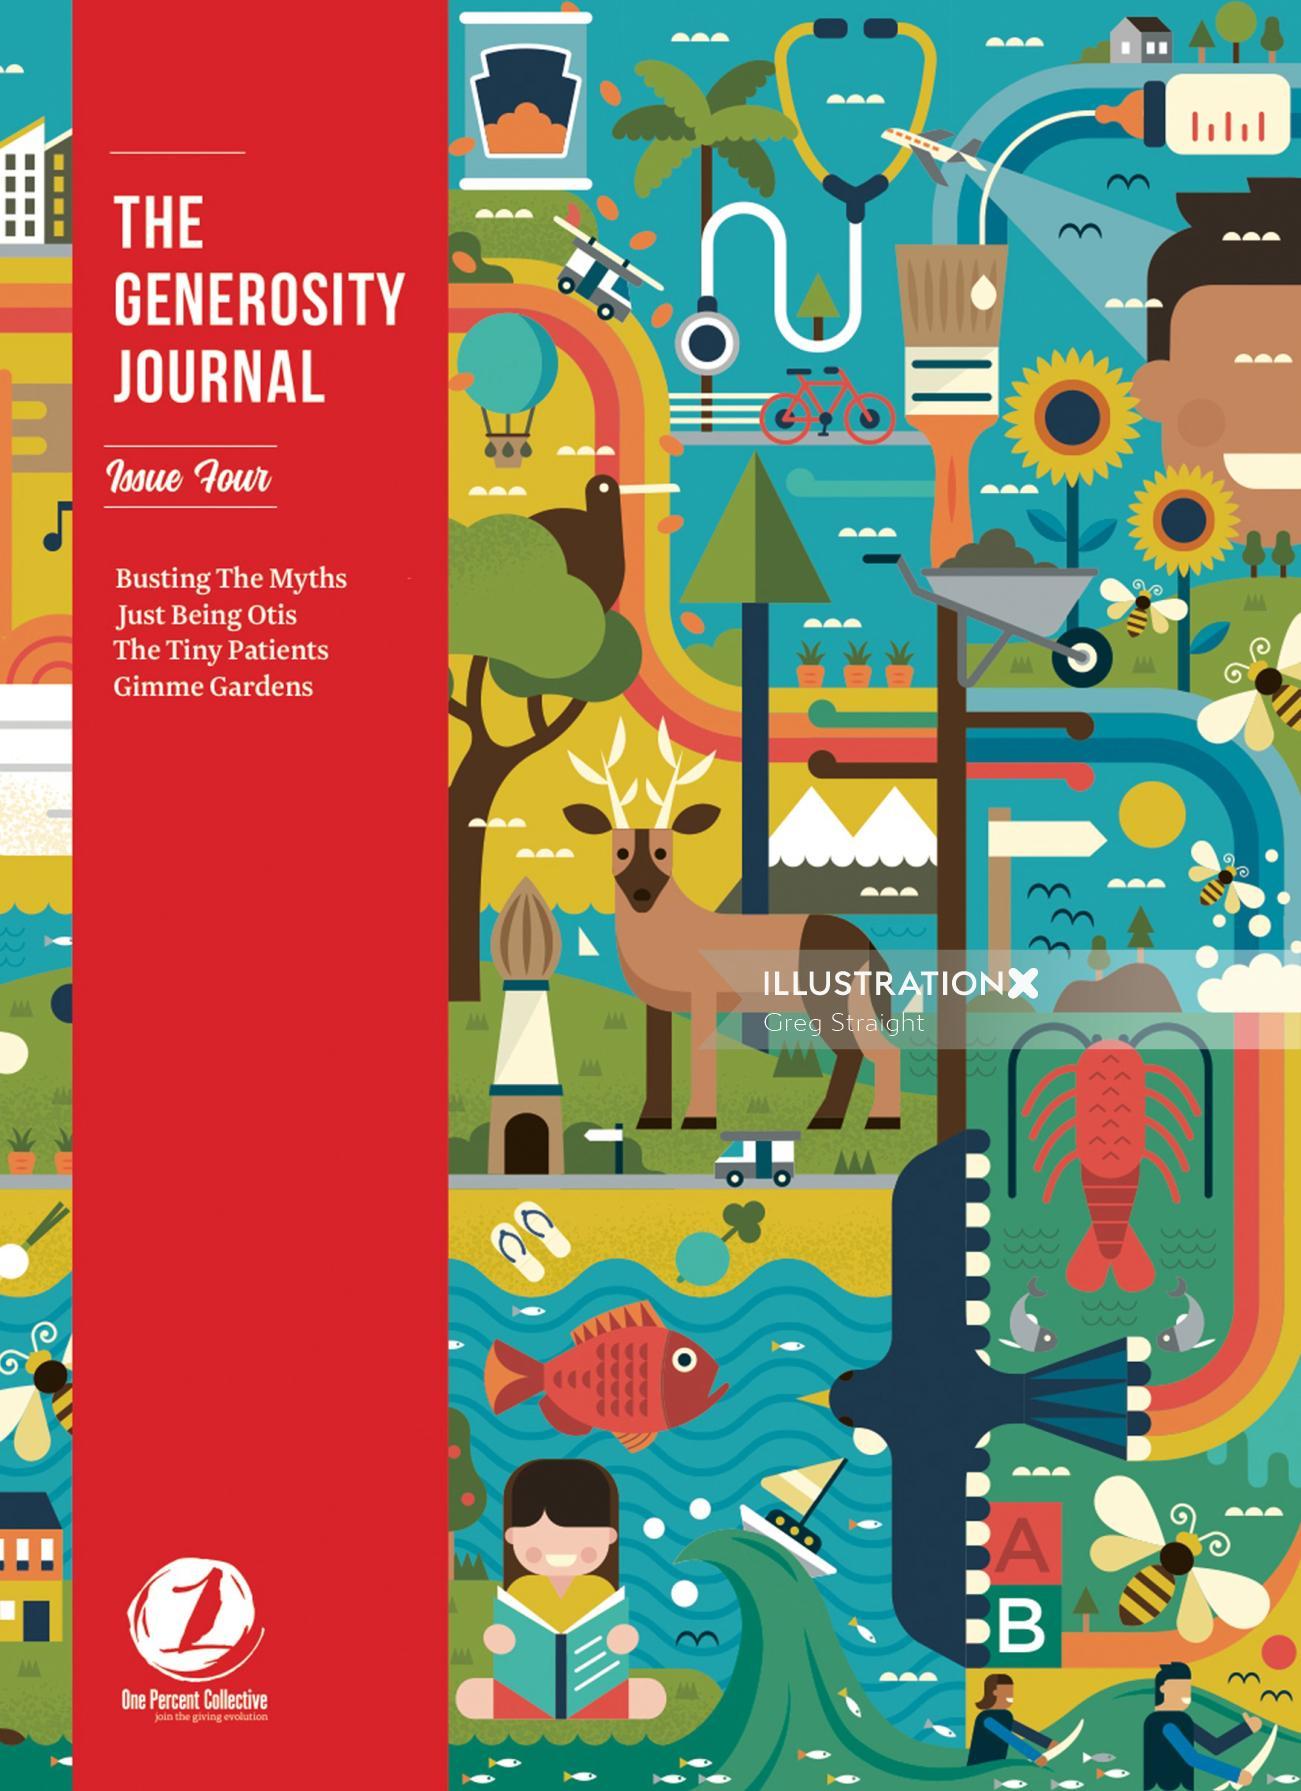 The Generosity Journal magazine cover illustration